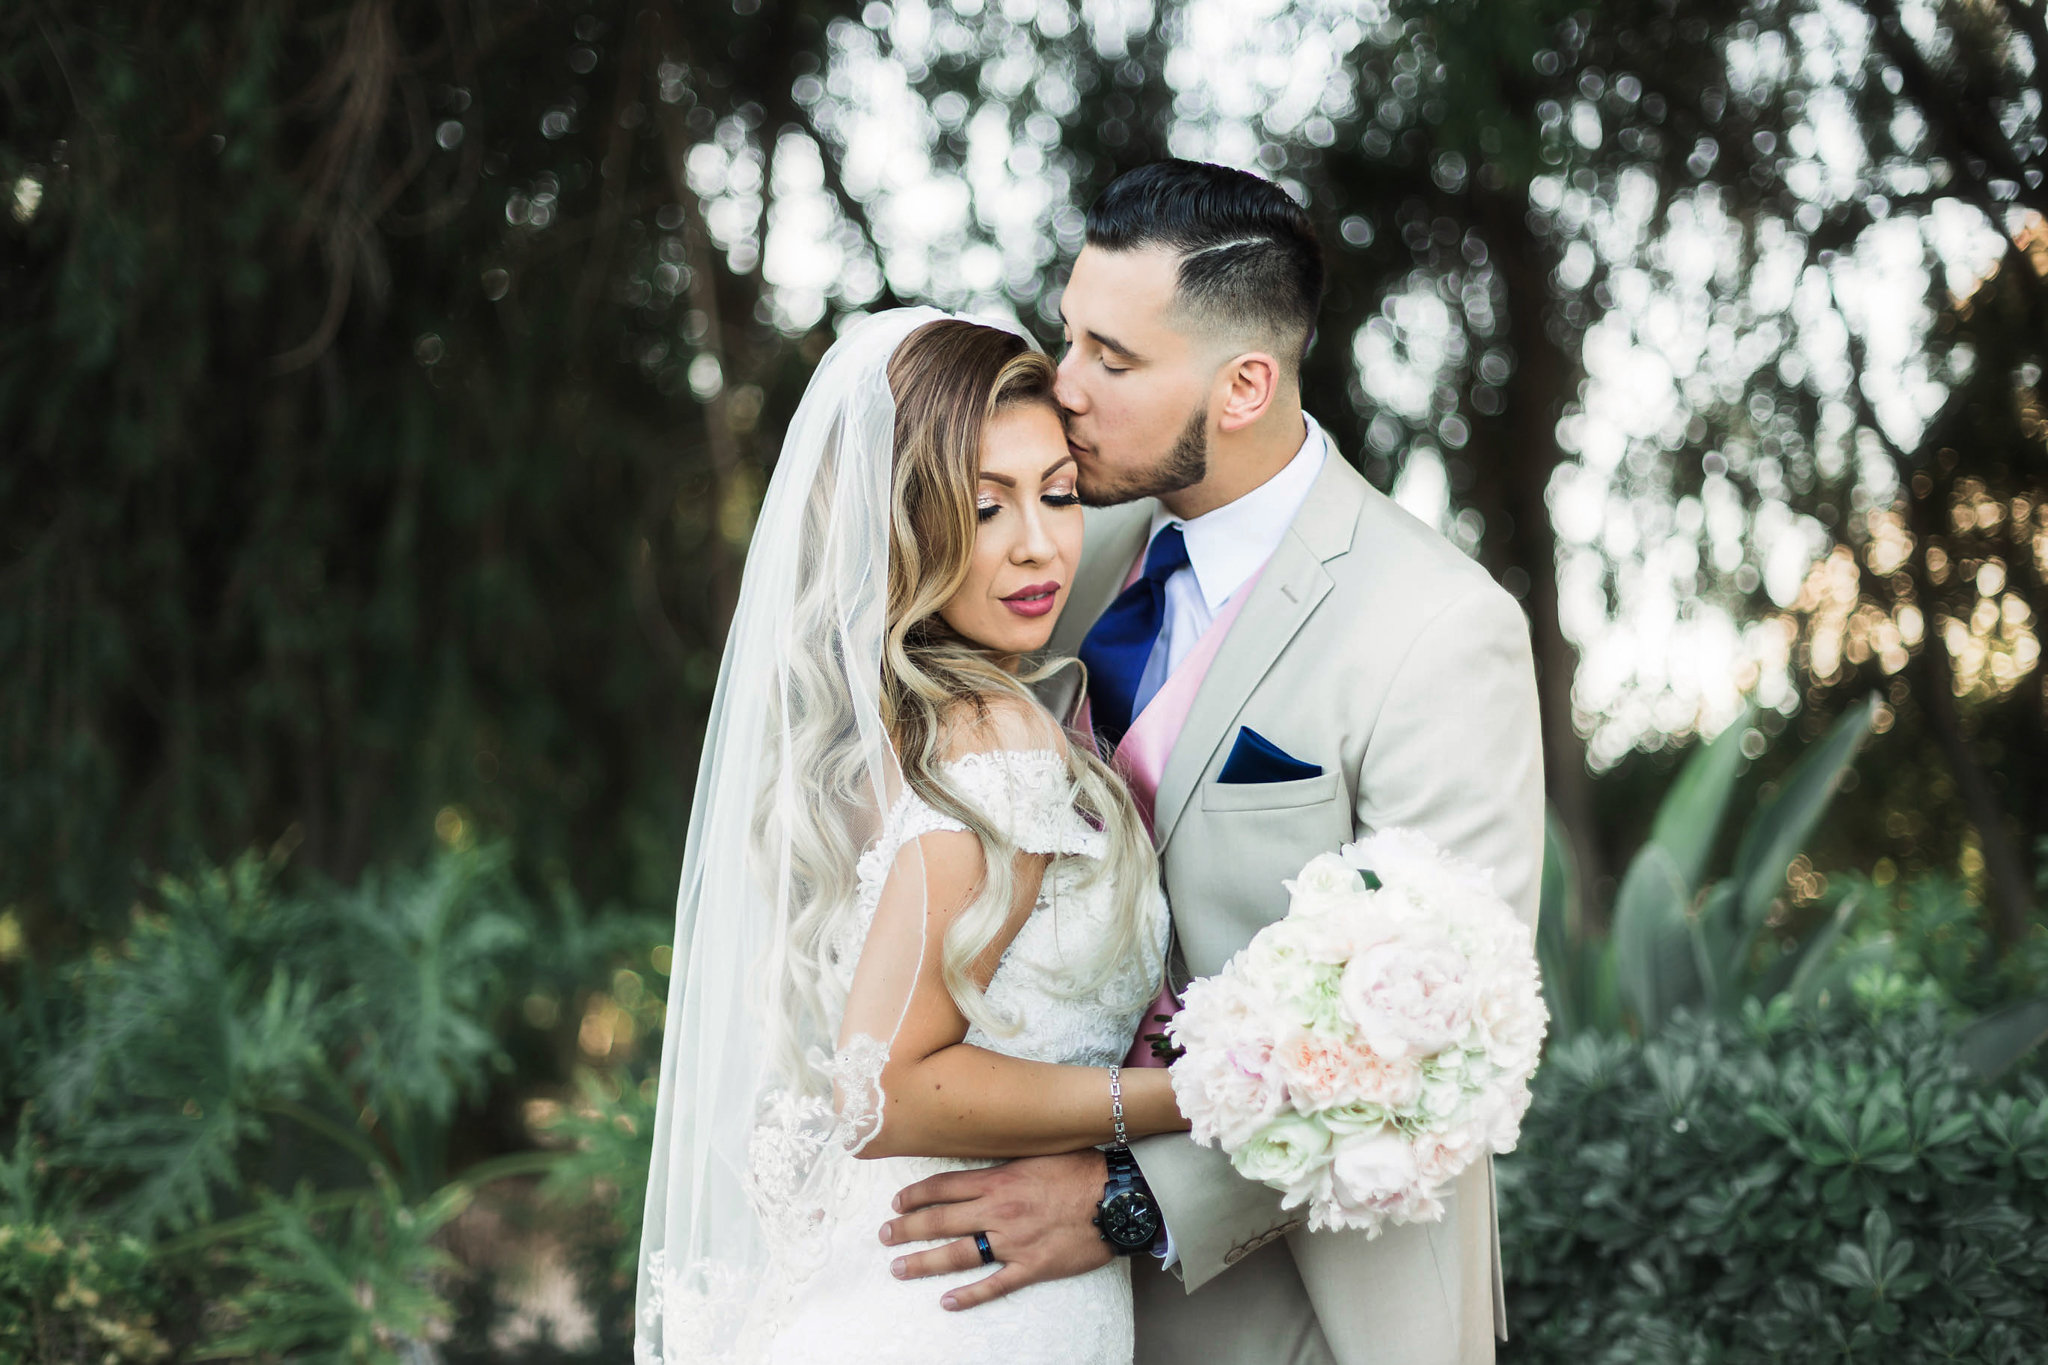 wedding-jaderandy-17.jpg